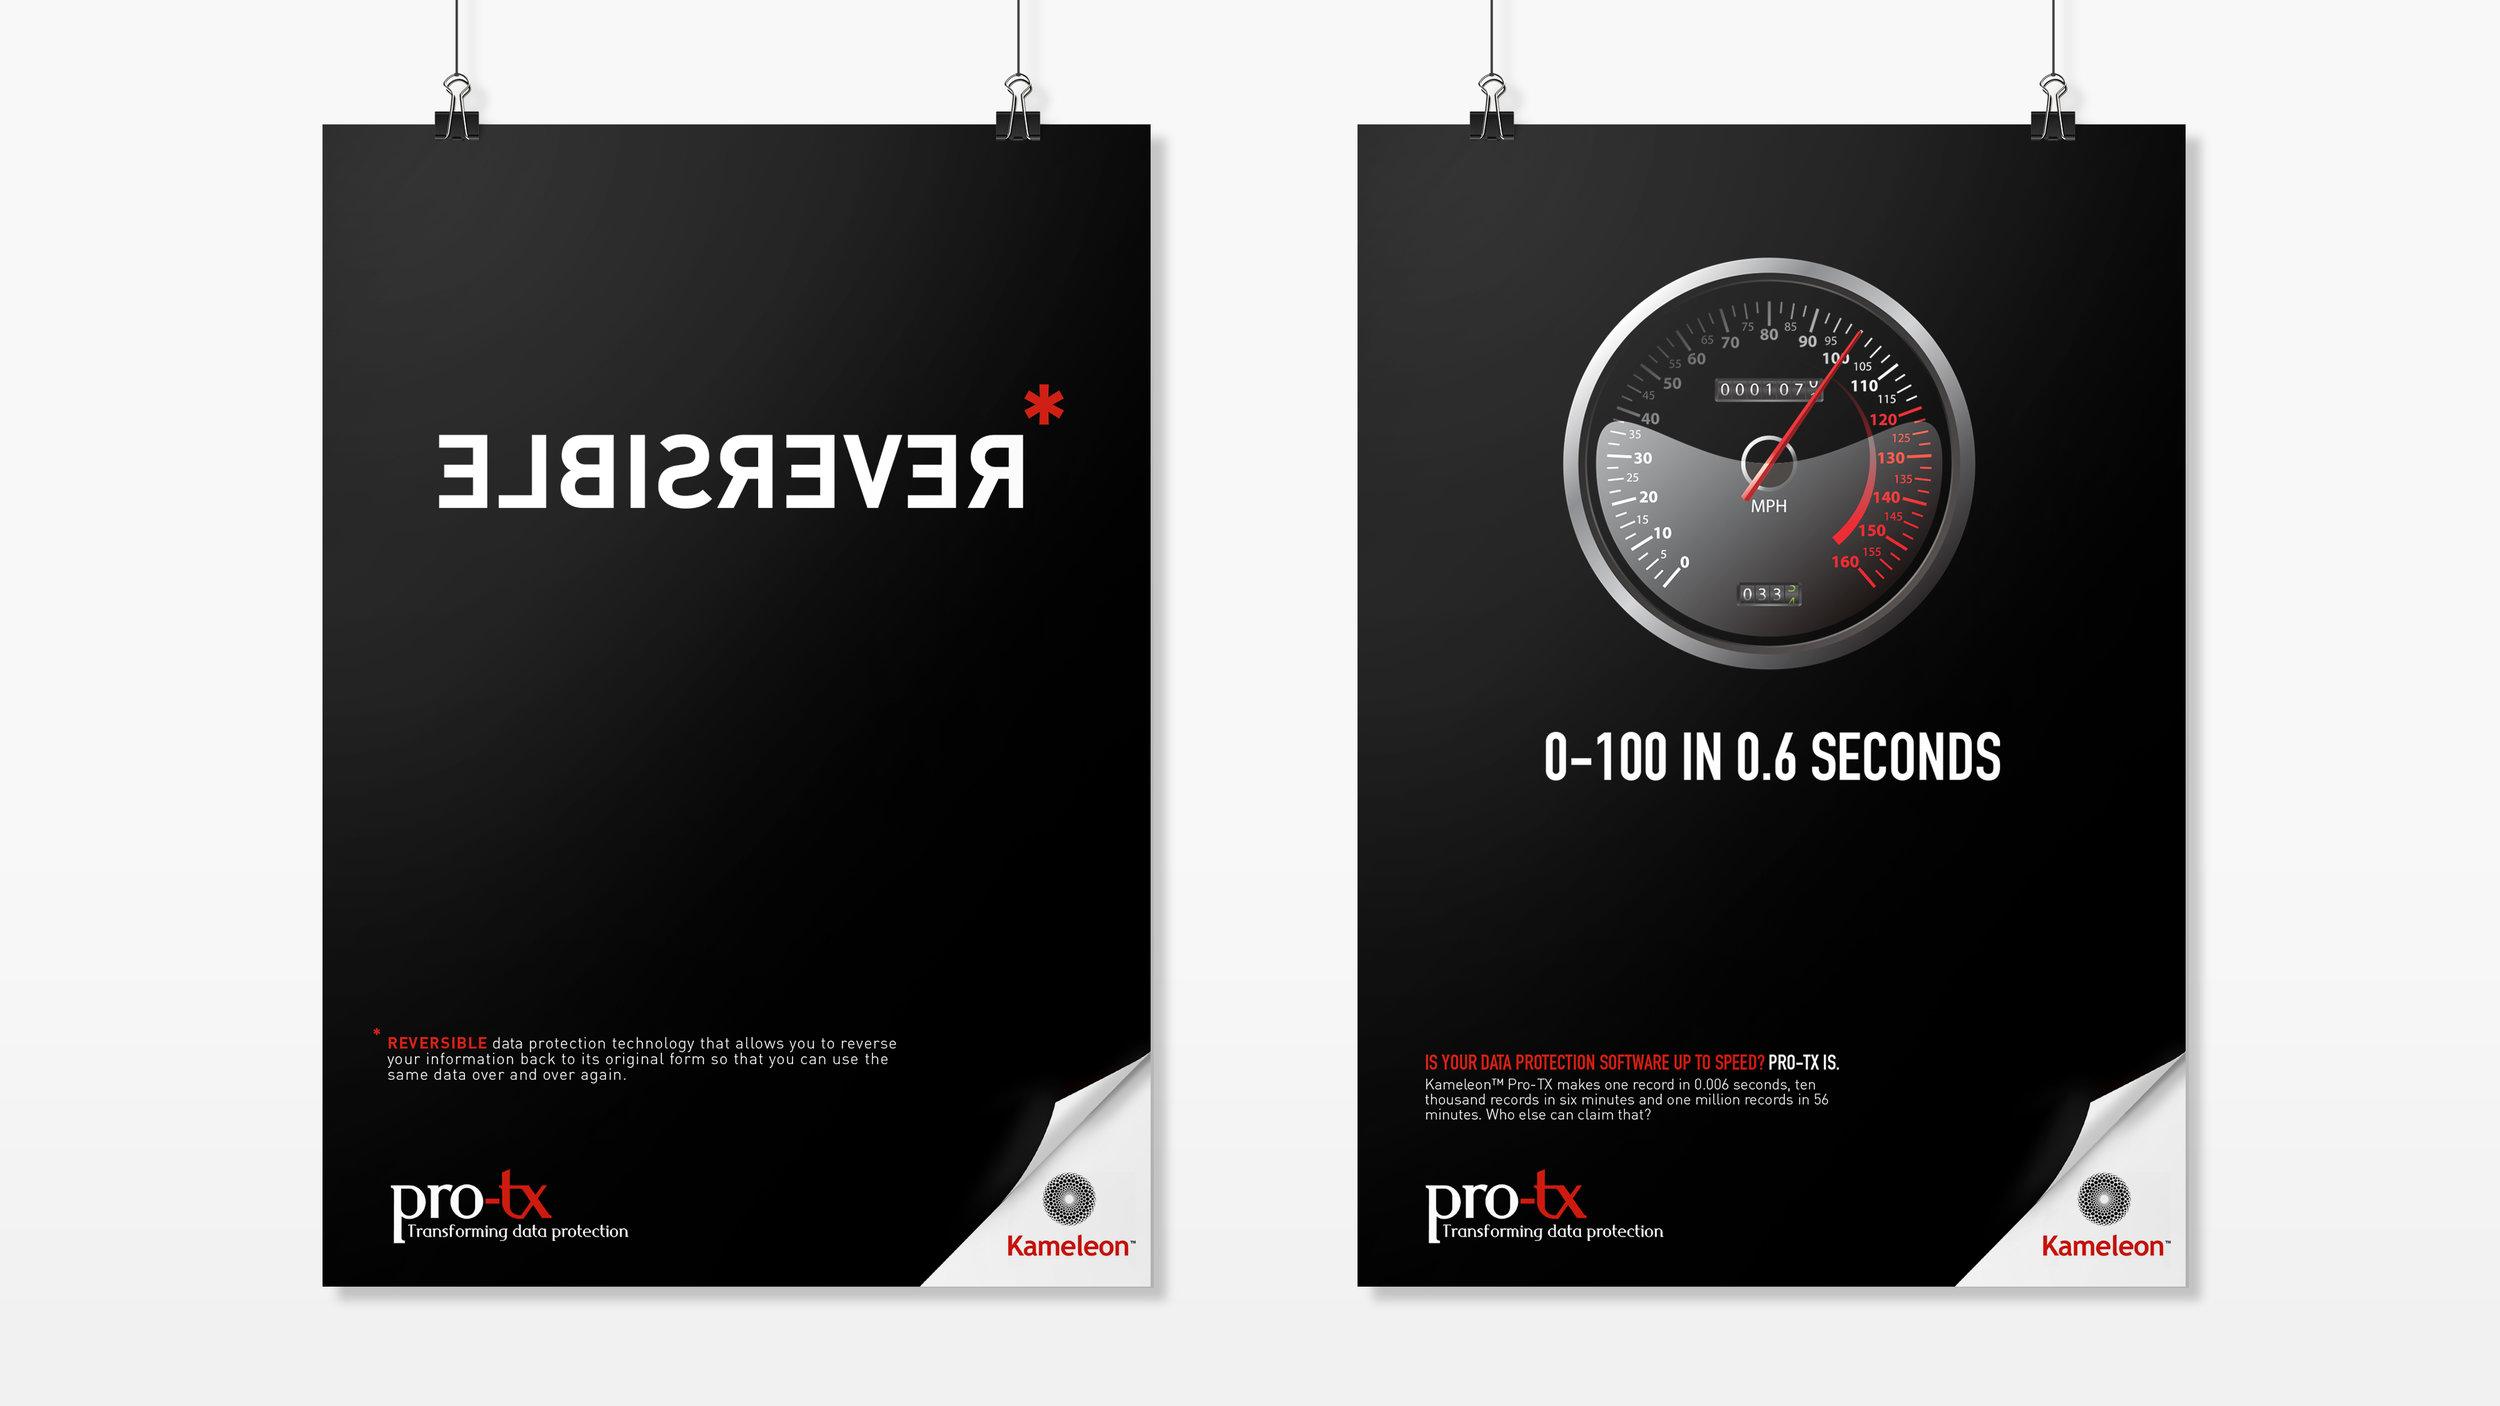 Brand_republica_Mastek_Kameleon_pro-tx_advertising_campaign_01.jpg